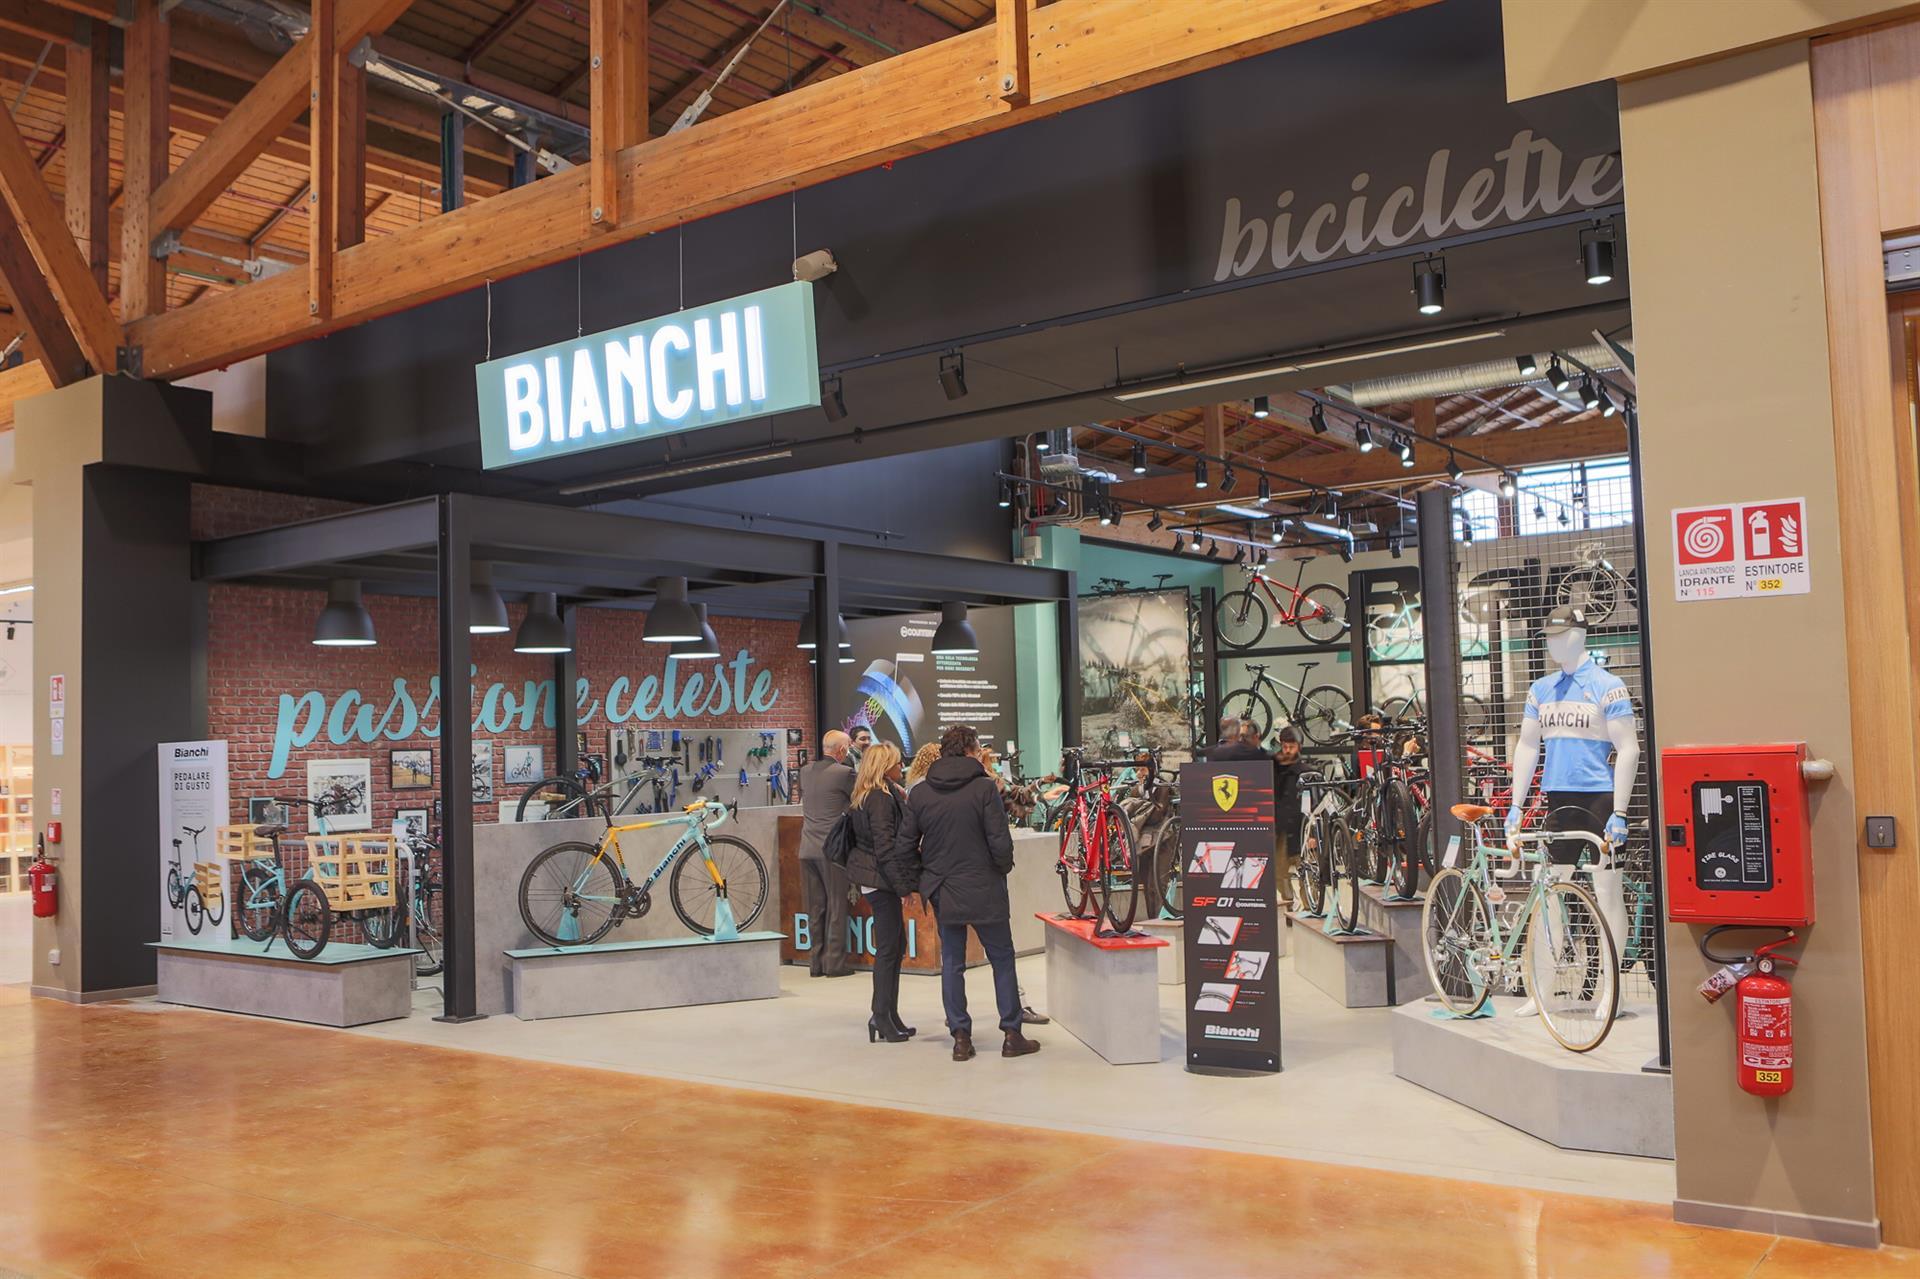 Bianchi Bike Store a FICO